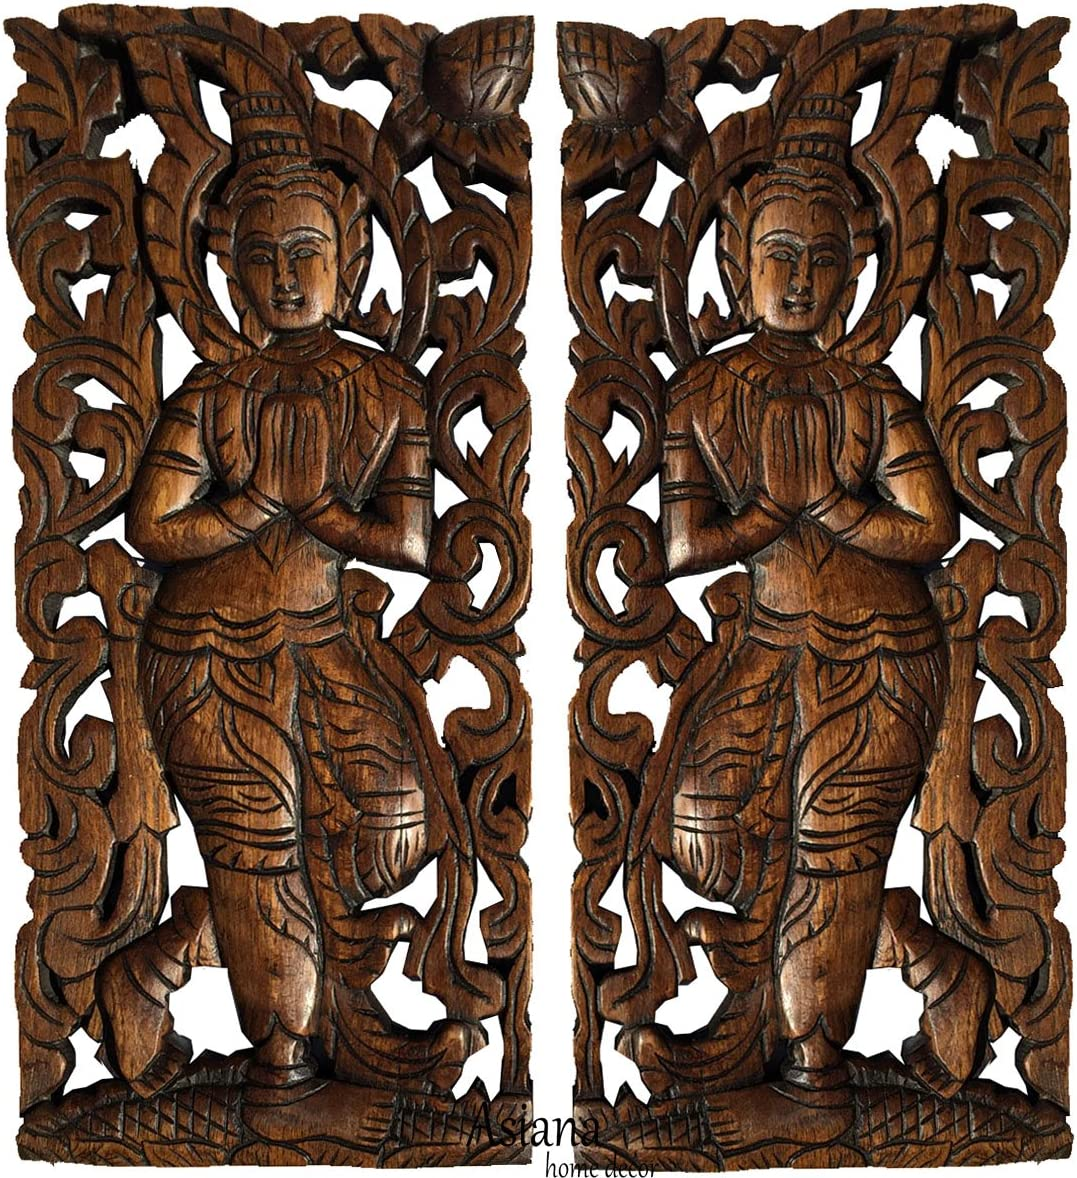 "Sawaddee Wall Sculpture. Thai Wood Wall Art - Asian Carved Wood Wall Decor Size 17.5""x7.5""x1 Each, Set of 2 Pcs."